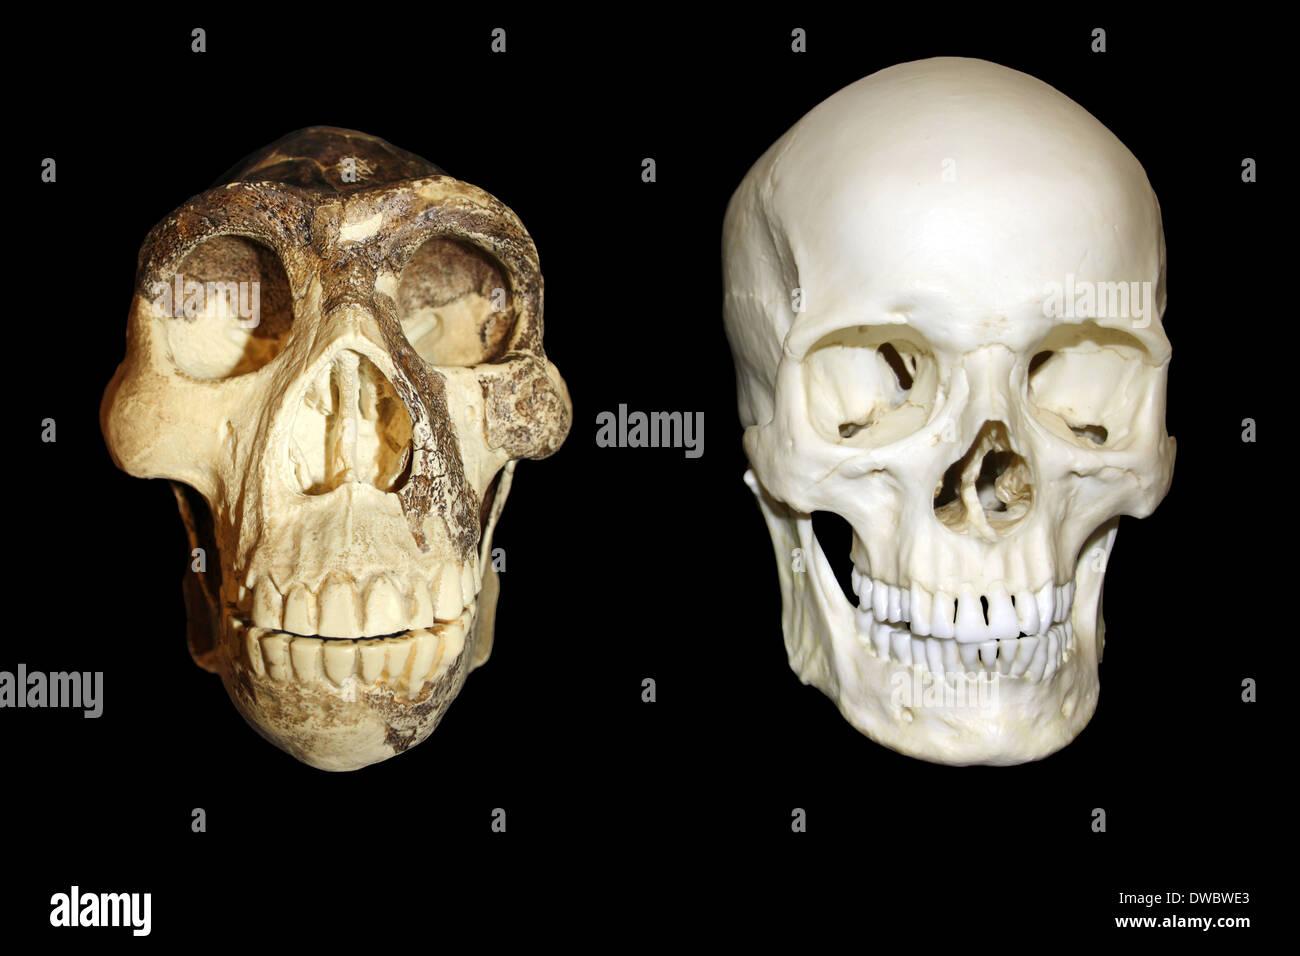 Zhoukoudian (Choukoutien) Homo erectus Skull vs Modern Homo sapiens Skull - Stock Image